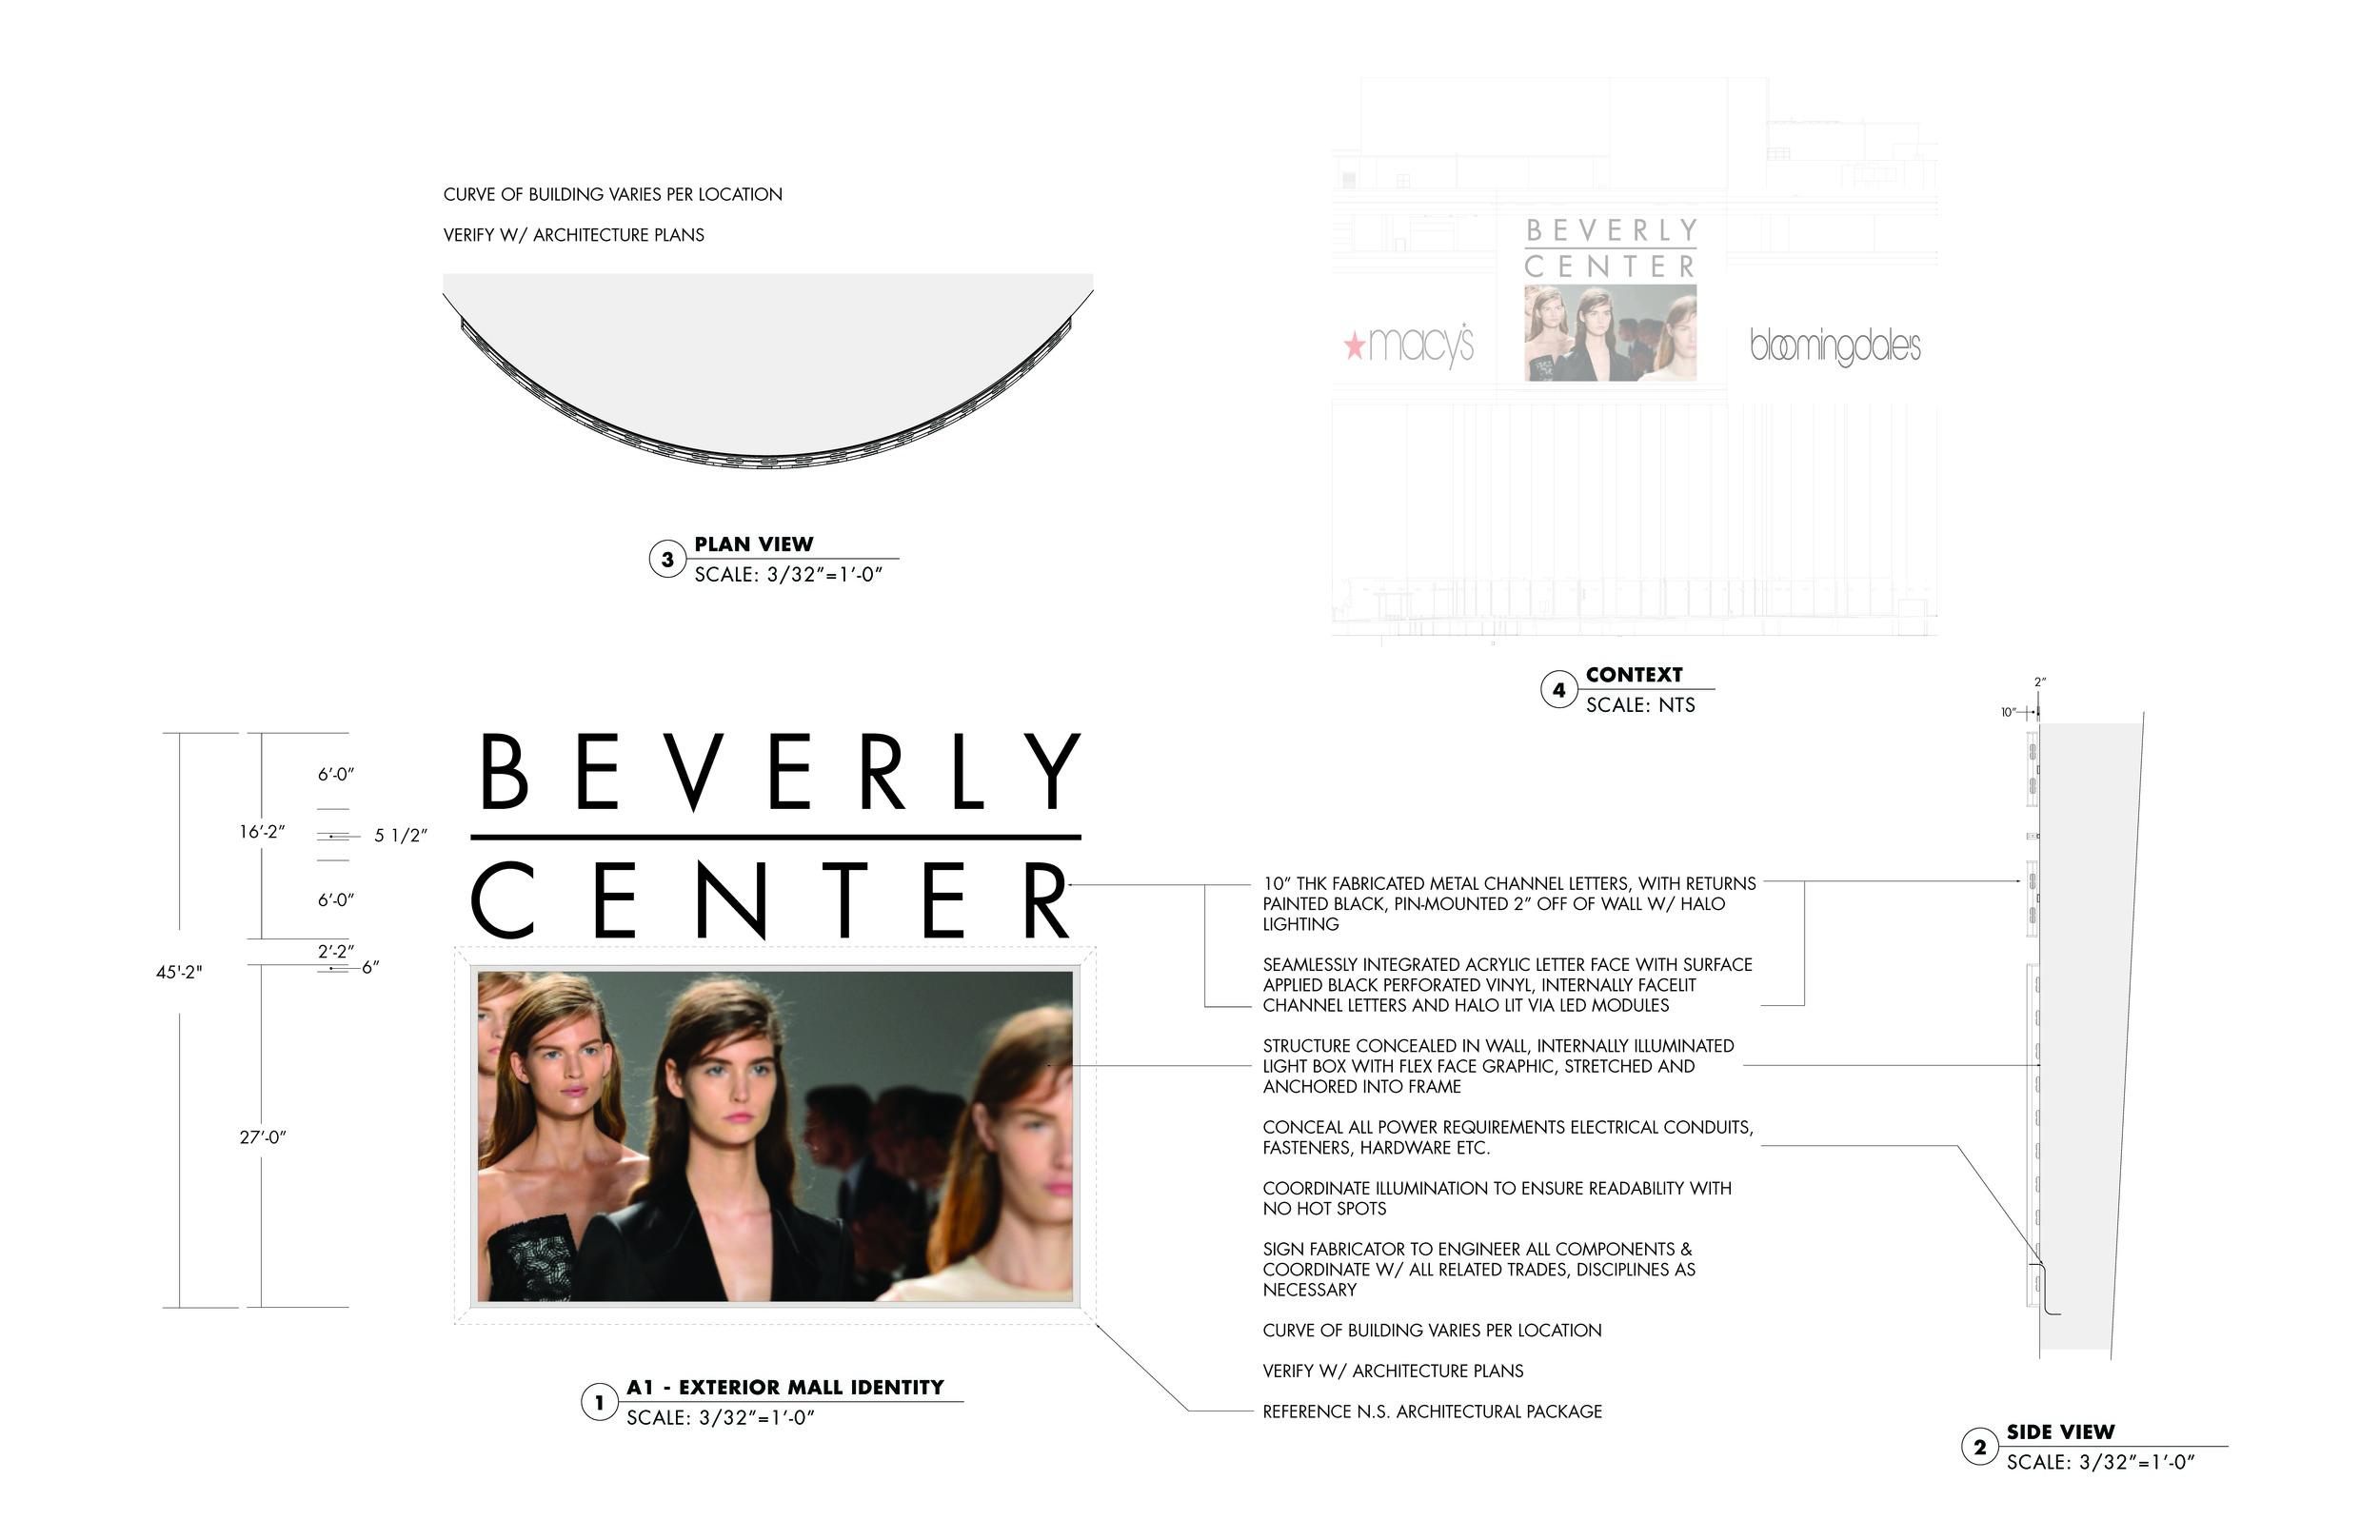 BC-A1+Exterior+Mall+Identity-0112.jpg